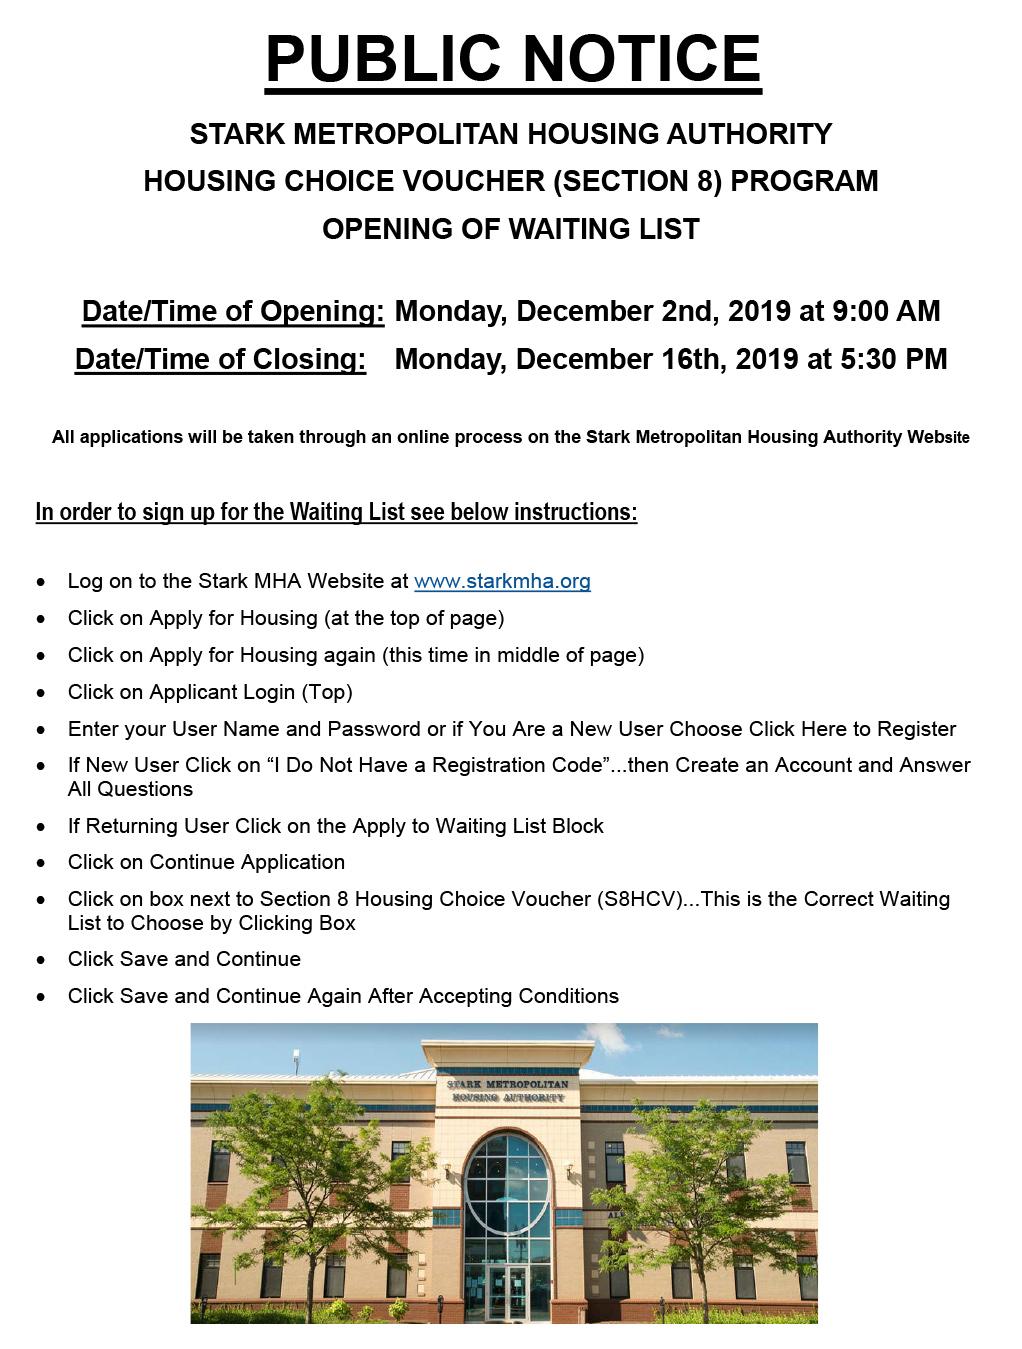 Public Notice Housing Choice Voucher Section 8 Waiting List Opening Stark Metropolitan Housing Authority Smha